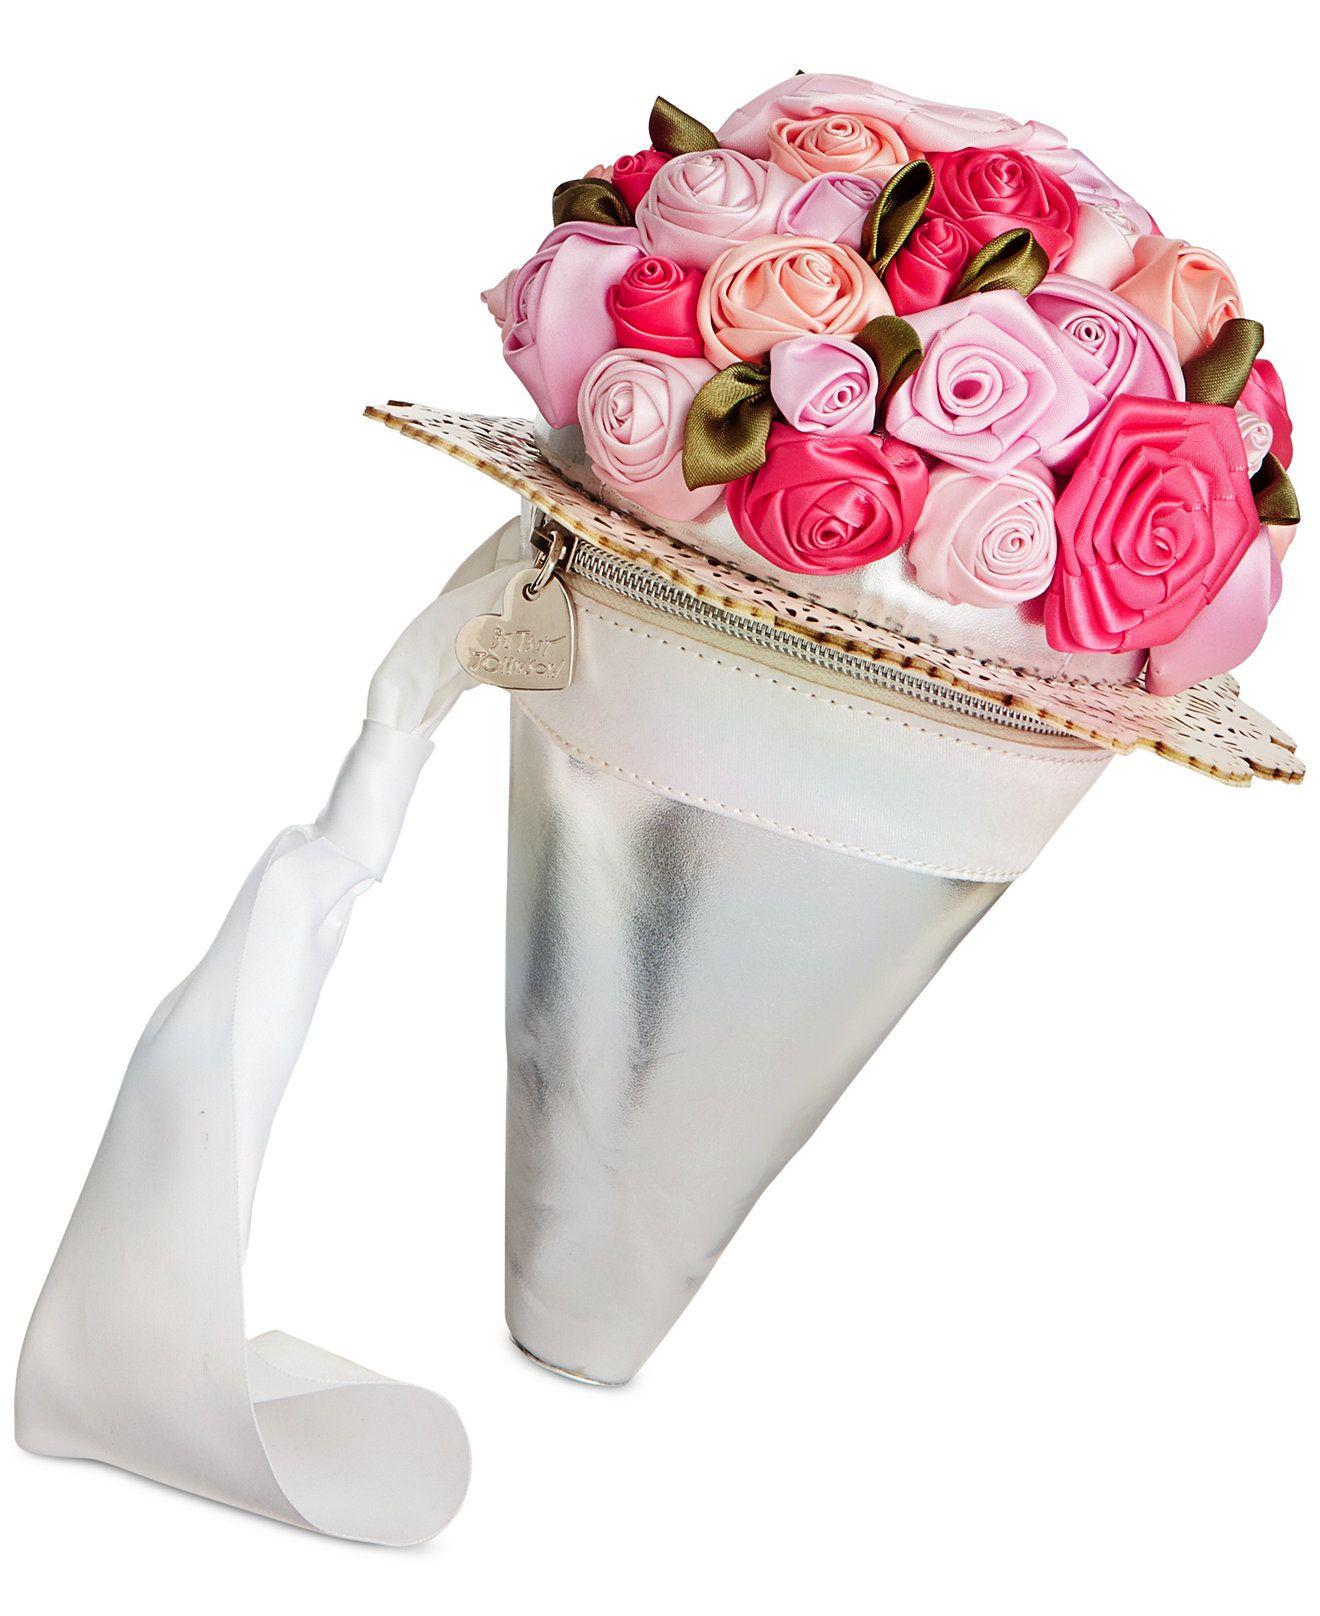 Blue By Betsey Johnson Bouquet Bag Wristlet Betsey Johnson